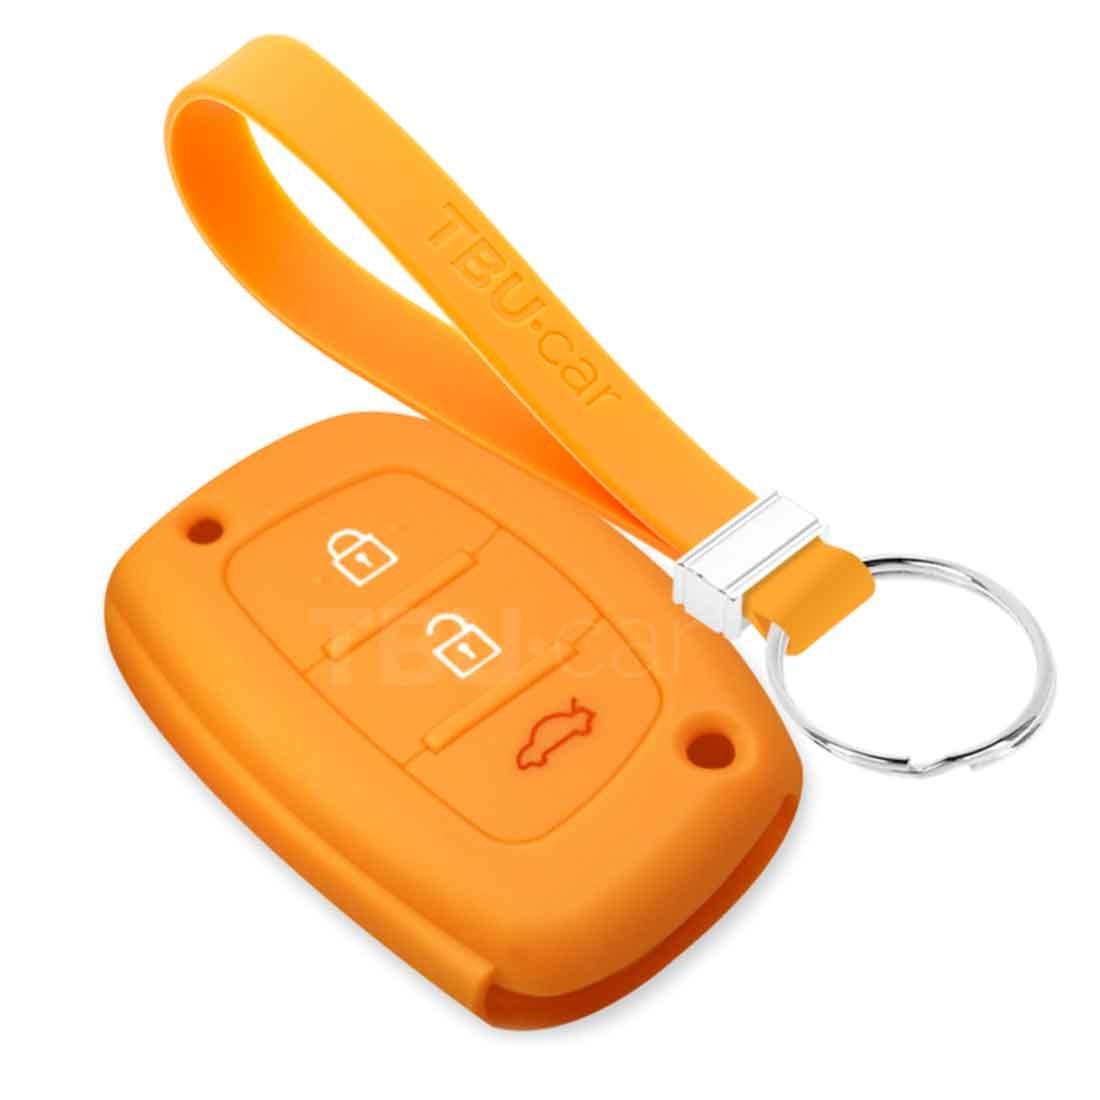 TBU car TBU car Autoschlüssel Hülle kompatibel mit Hyundai 3 Tasten (Keyless Entry) - Schutzhülle aus Silikon - Auto Schlüsselhülle Cover in Orange